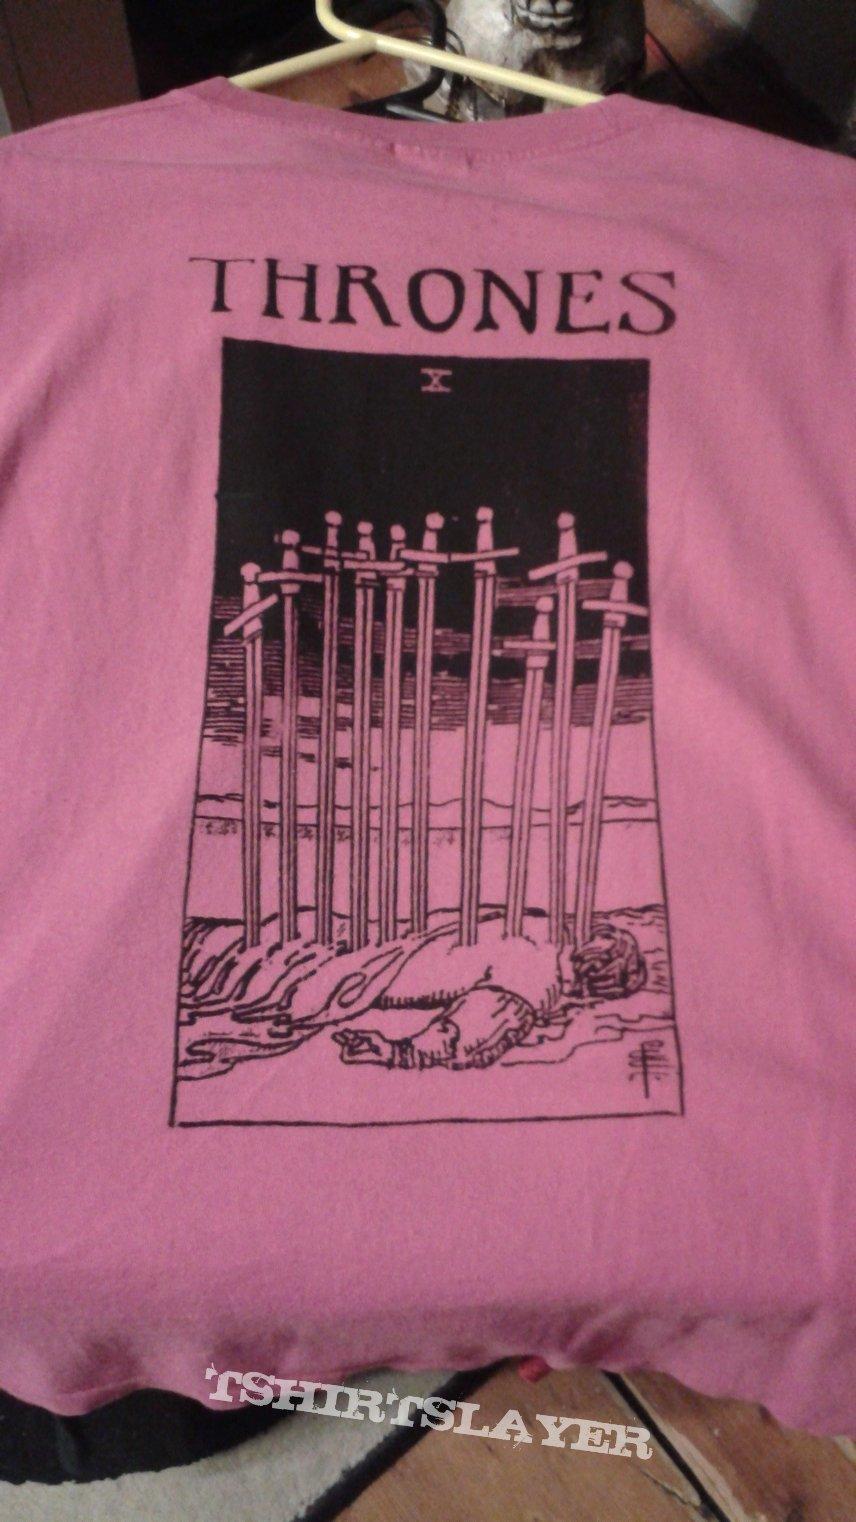 Thrones tarot card design t-shirt.